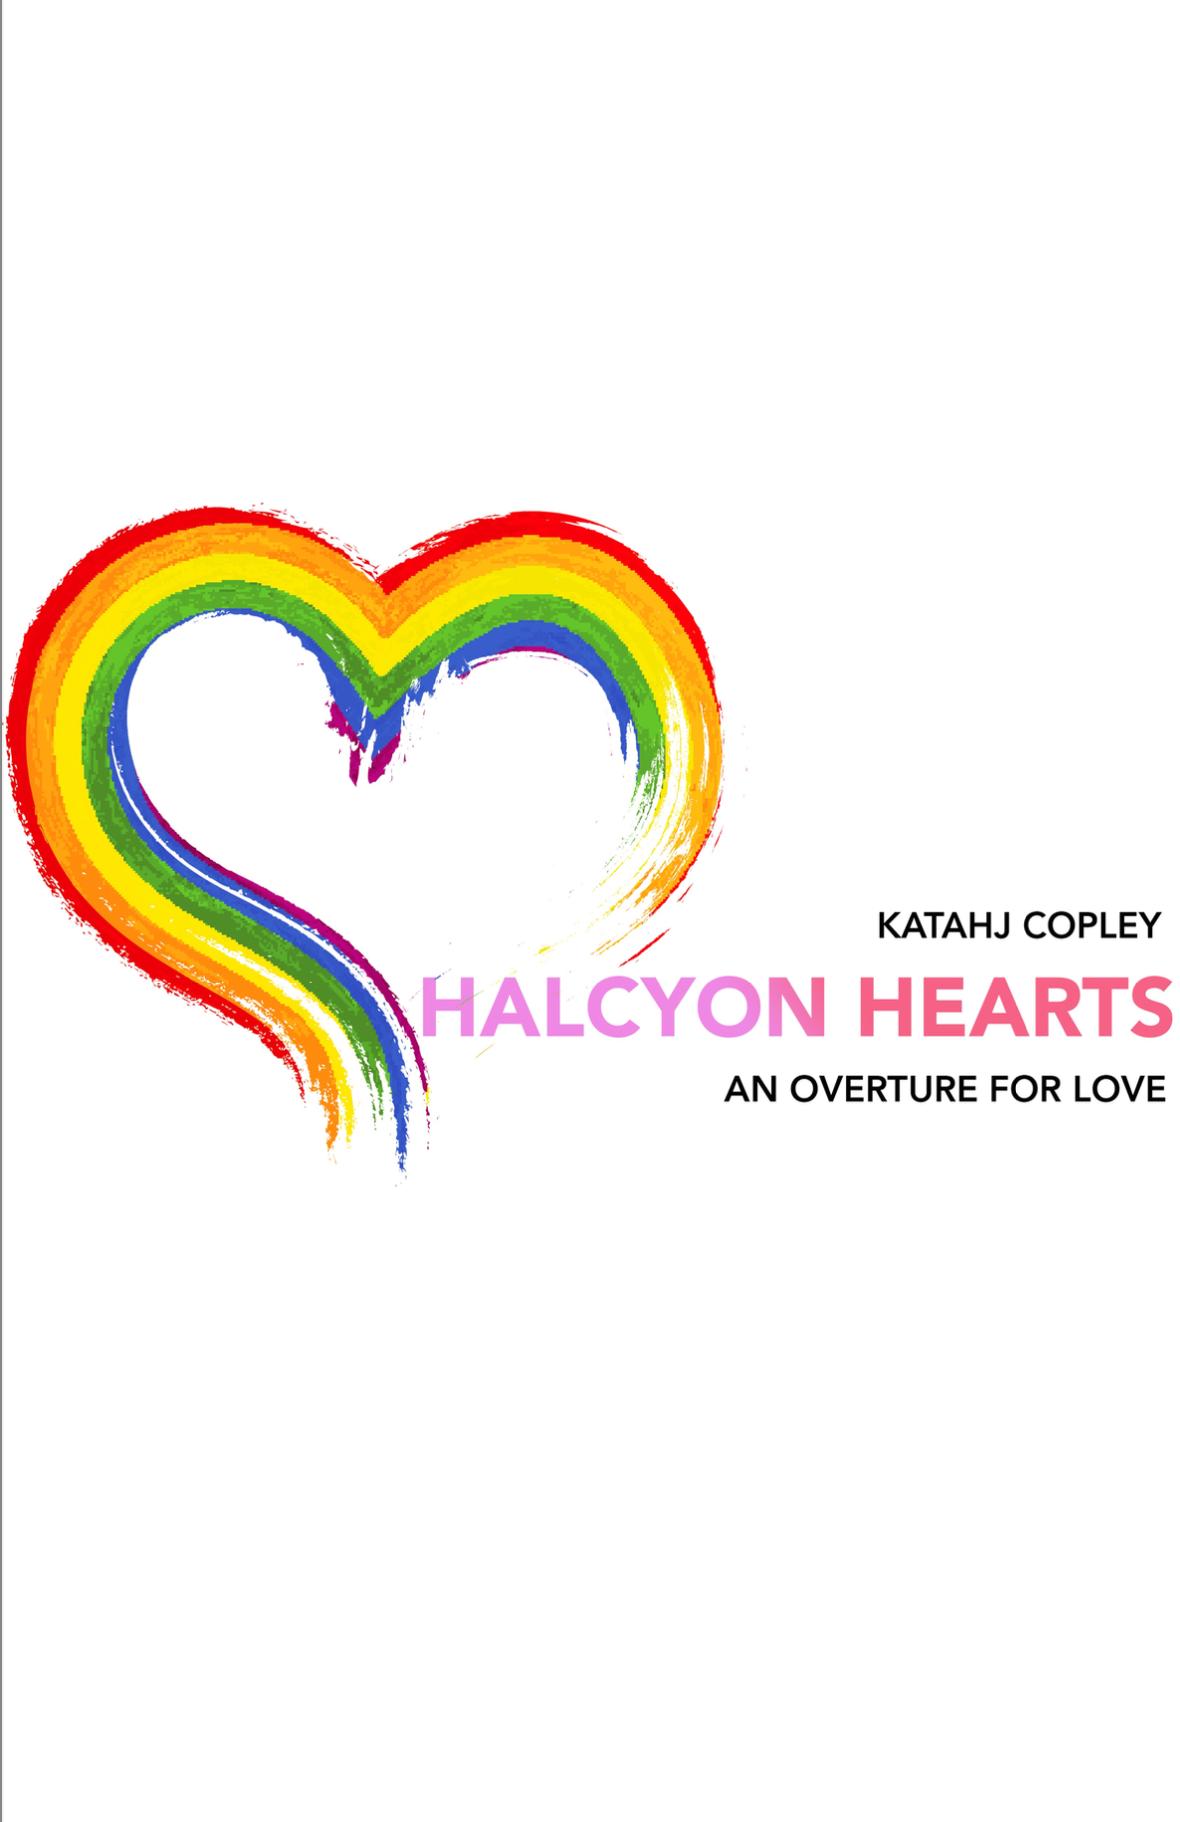 Halcyon Hearts by Katahj Copley